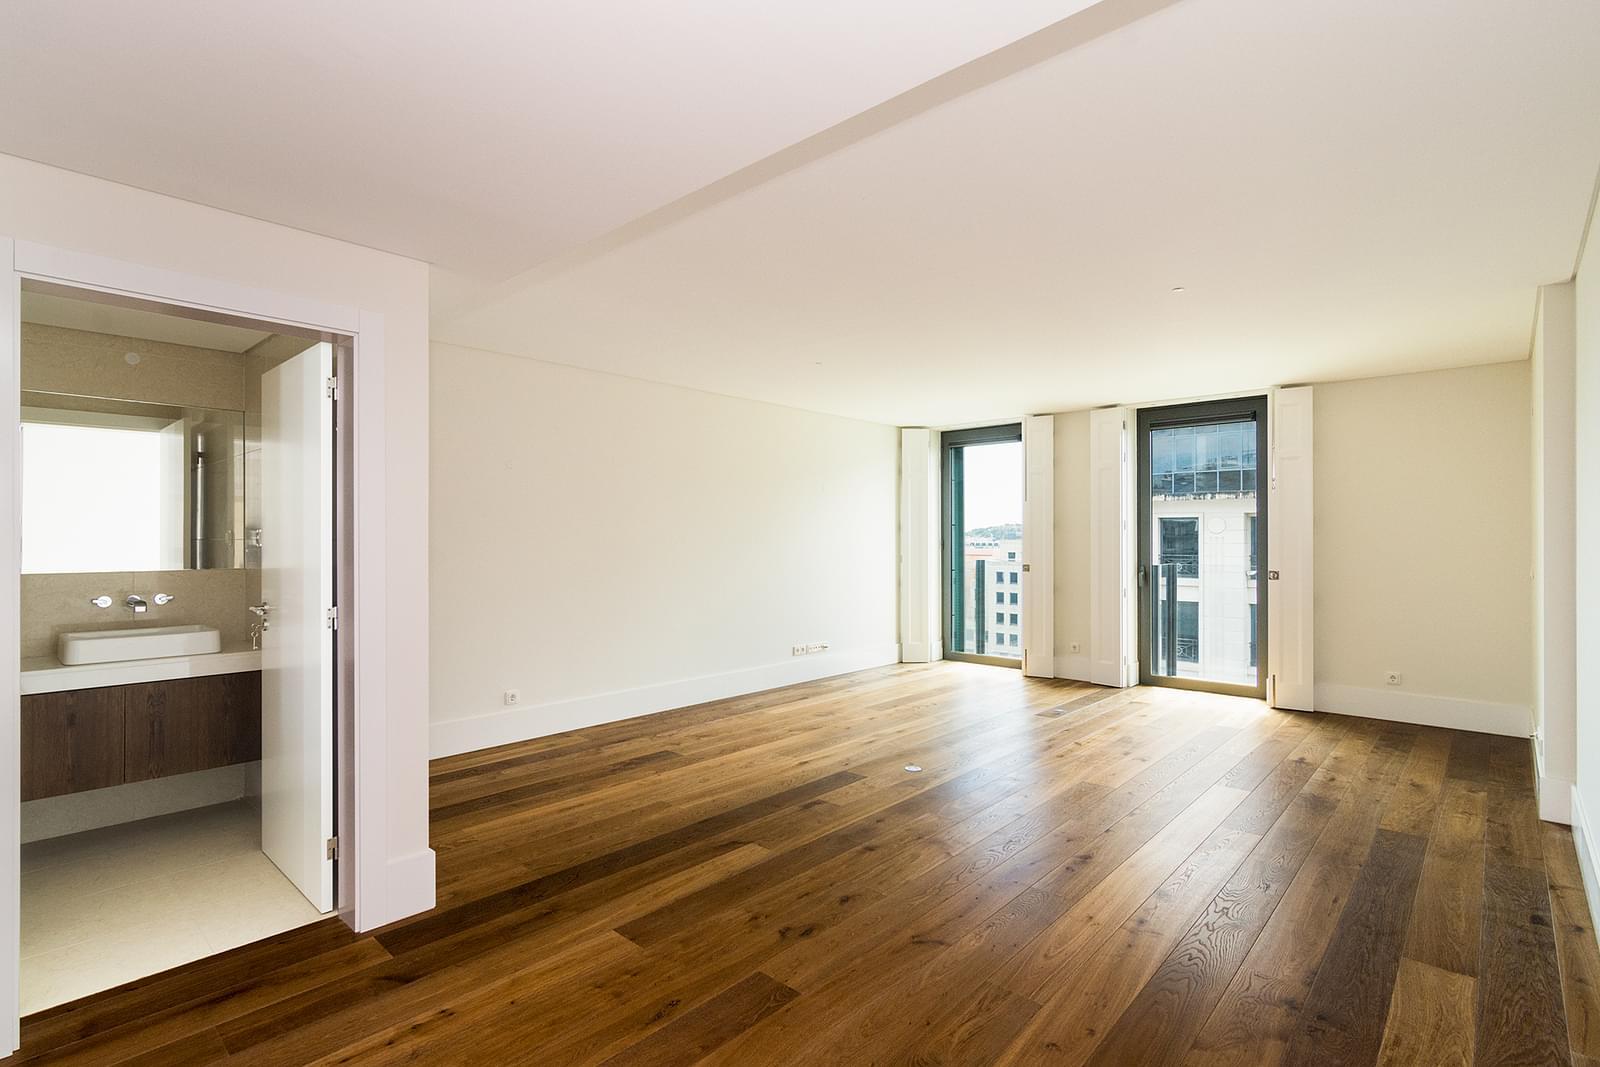 pf17442-apartamento-t3-lisboa-449d6f61-96f3-4ab4-b918-c9f22dd2888d